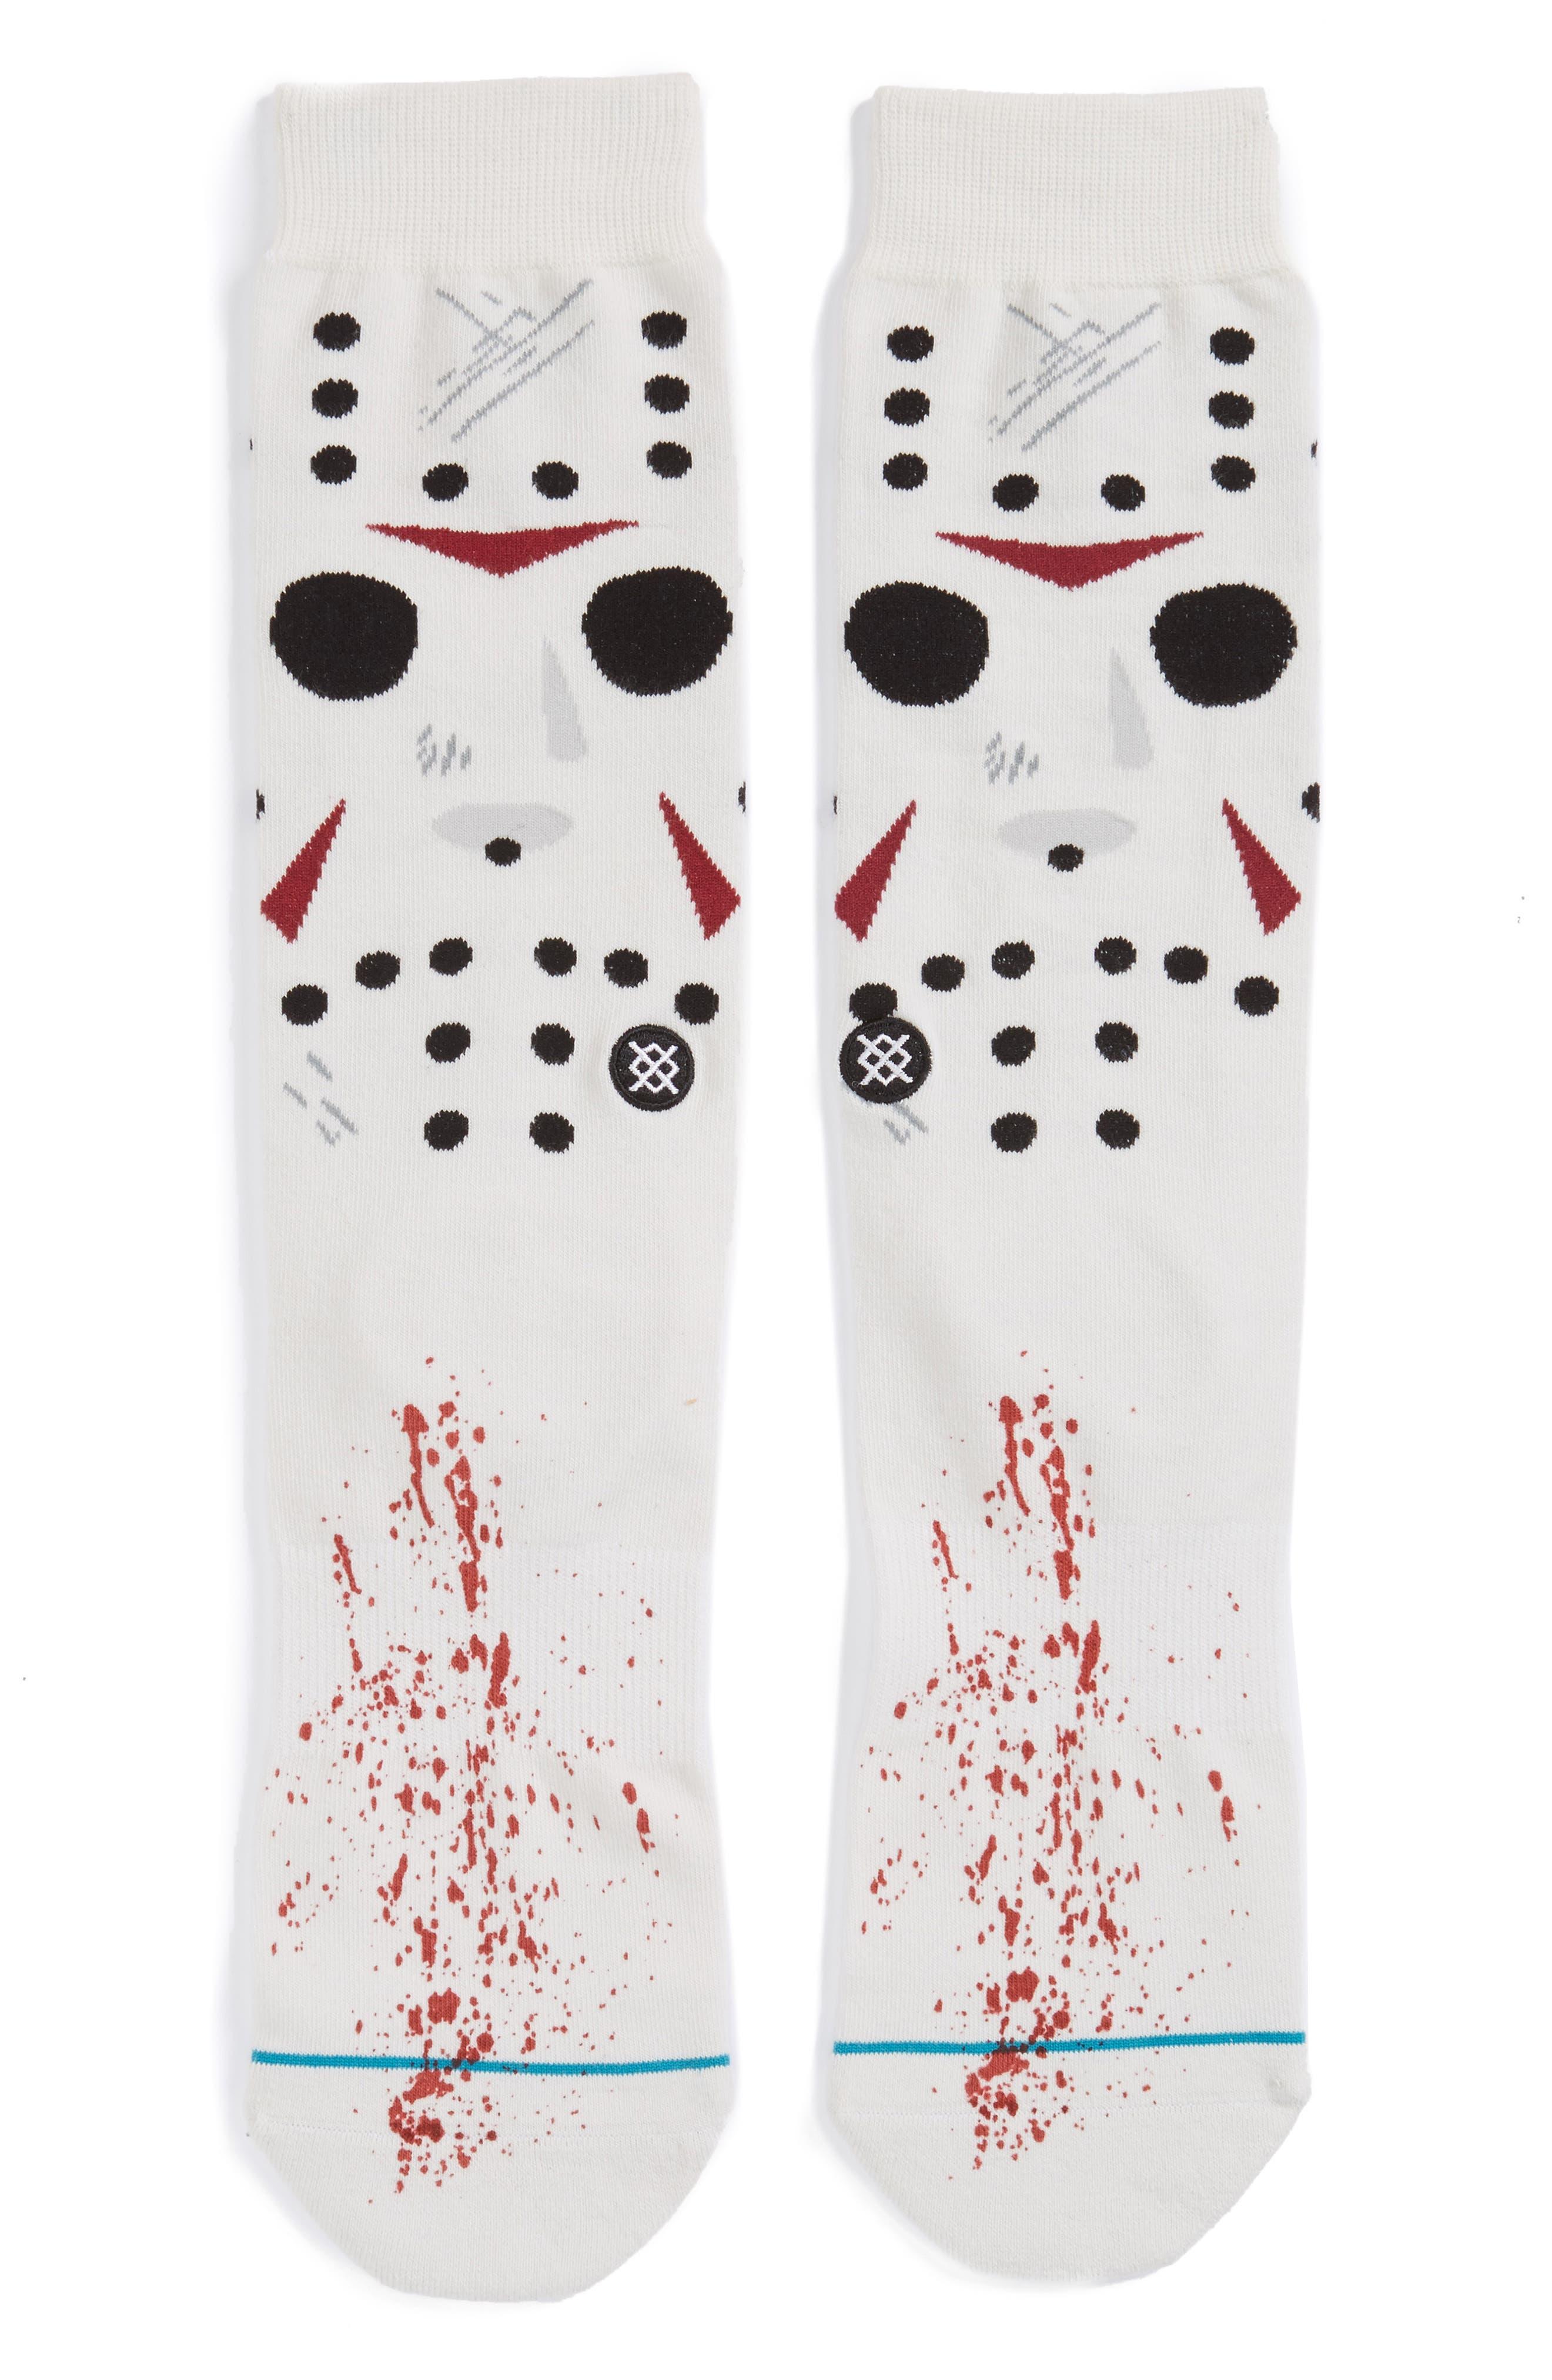 Jason - Legends of Horror Socks,                             Main thumbnail 1, color,                             100